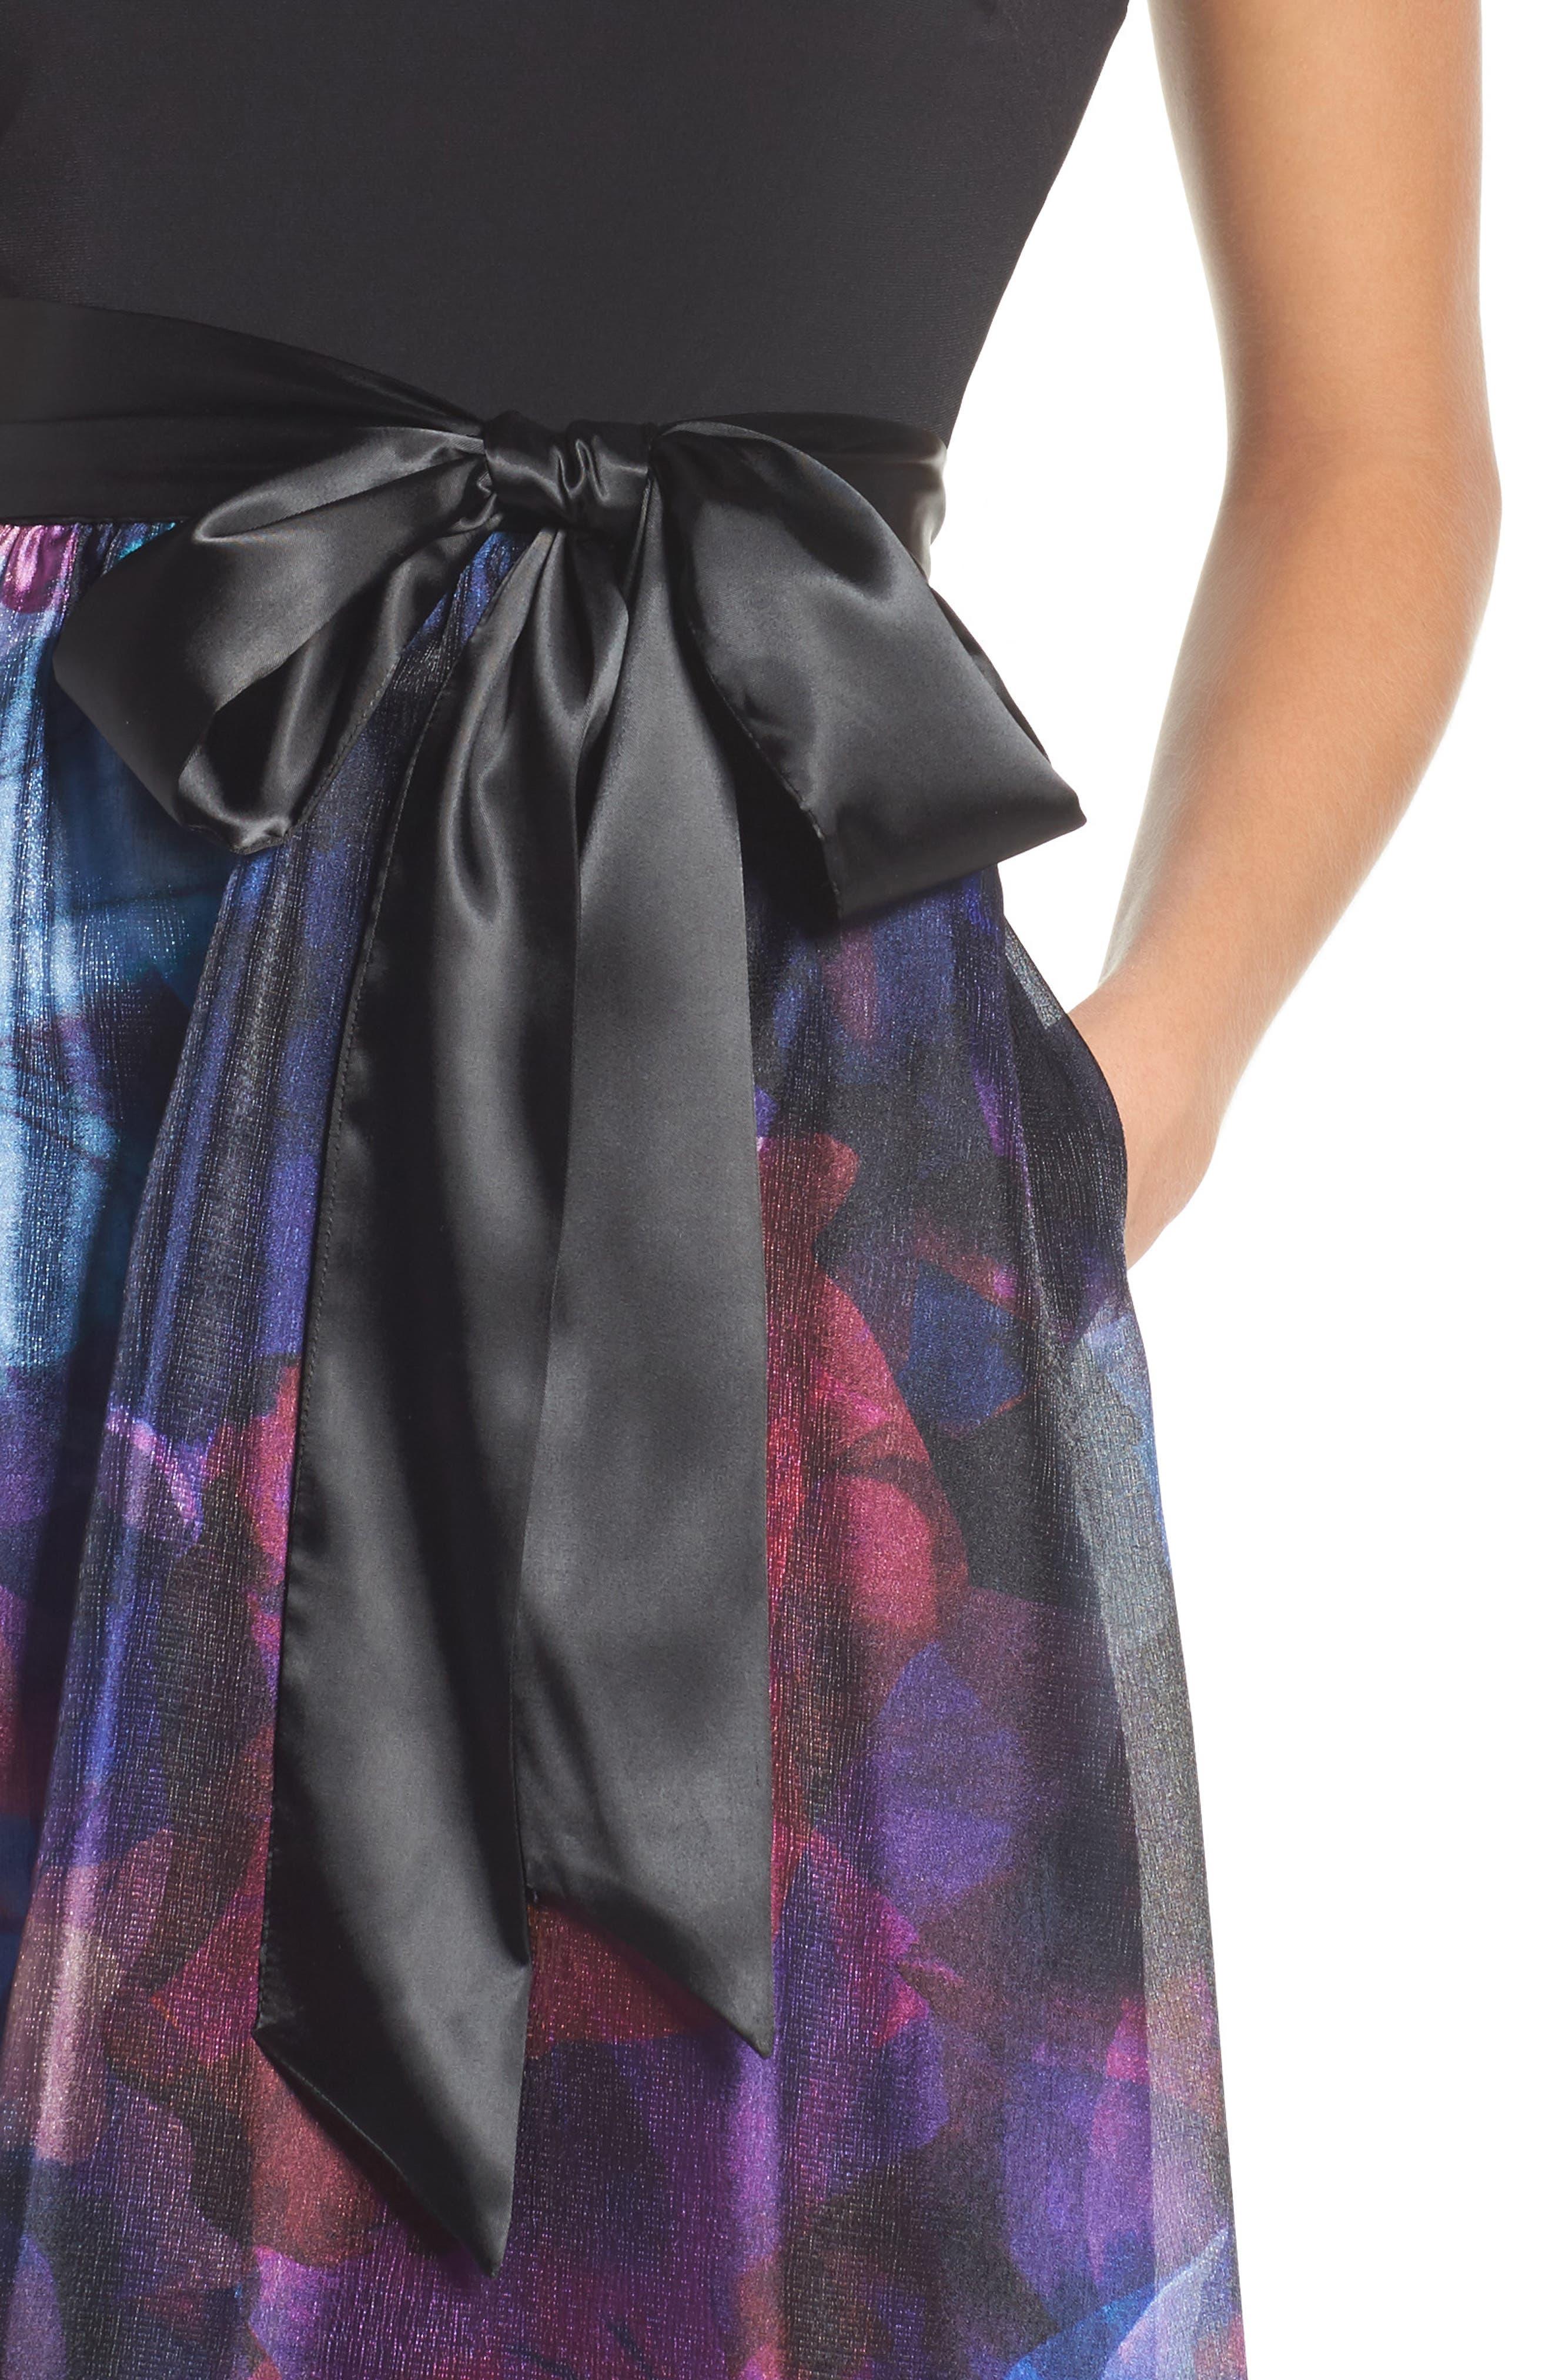 Floral Splash Mixed Media Maxi Dress,                             Alternate thumbnail 4, color,                             002